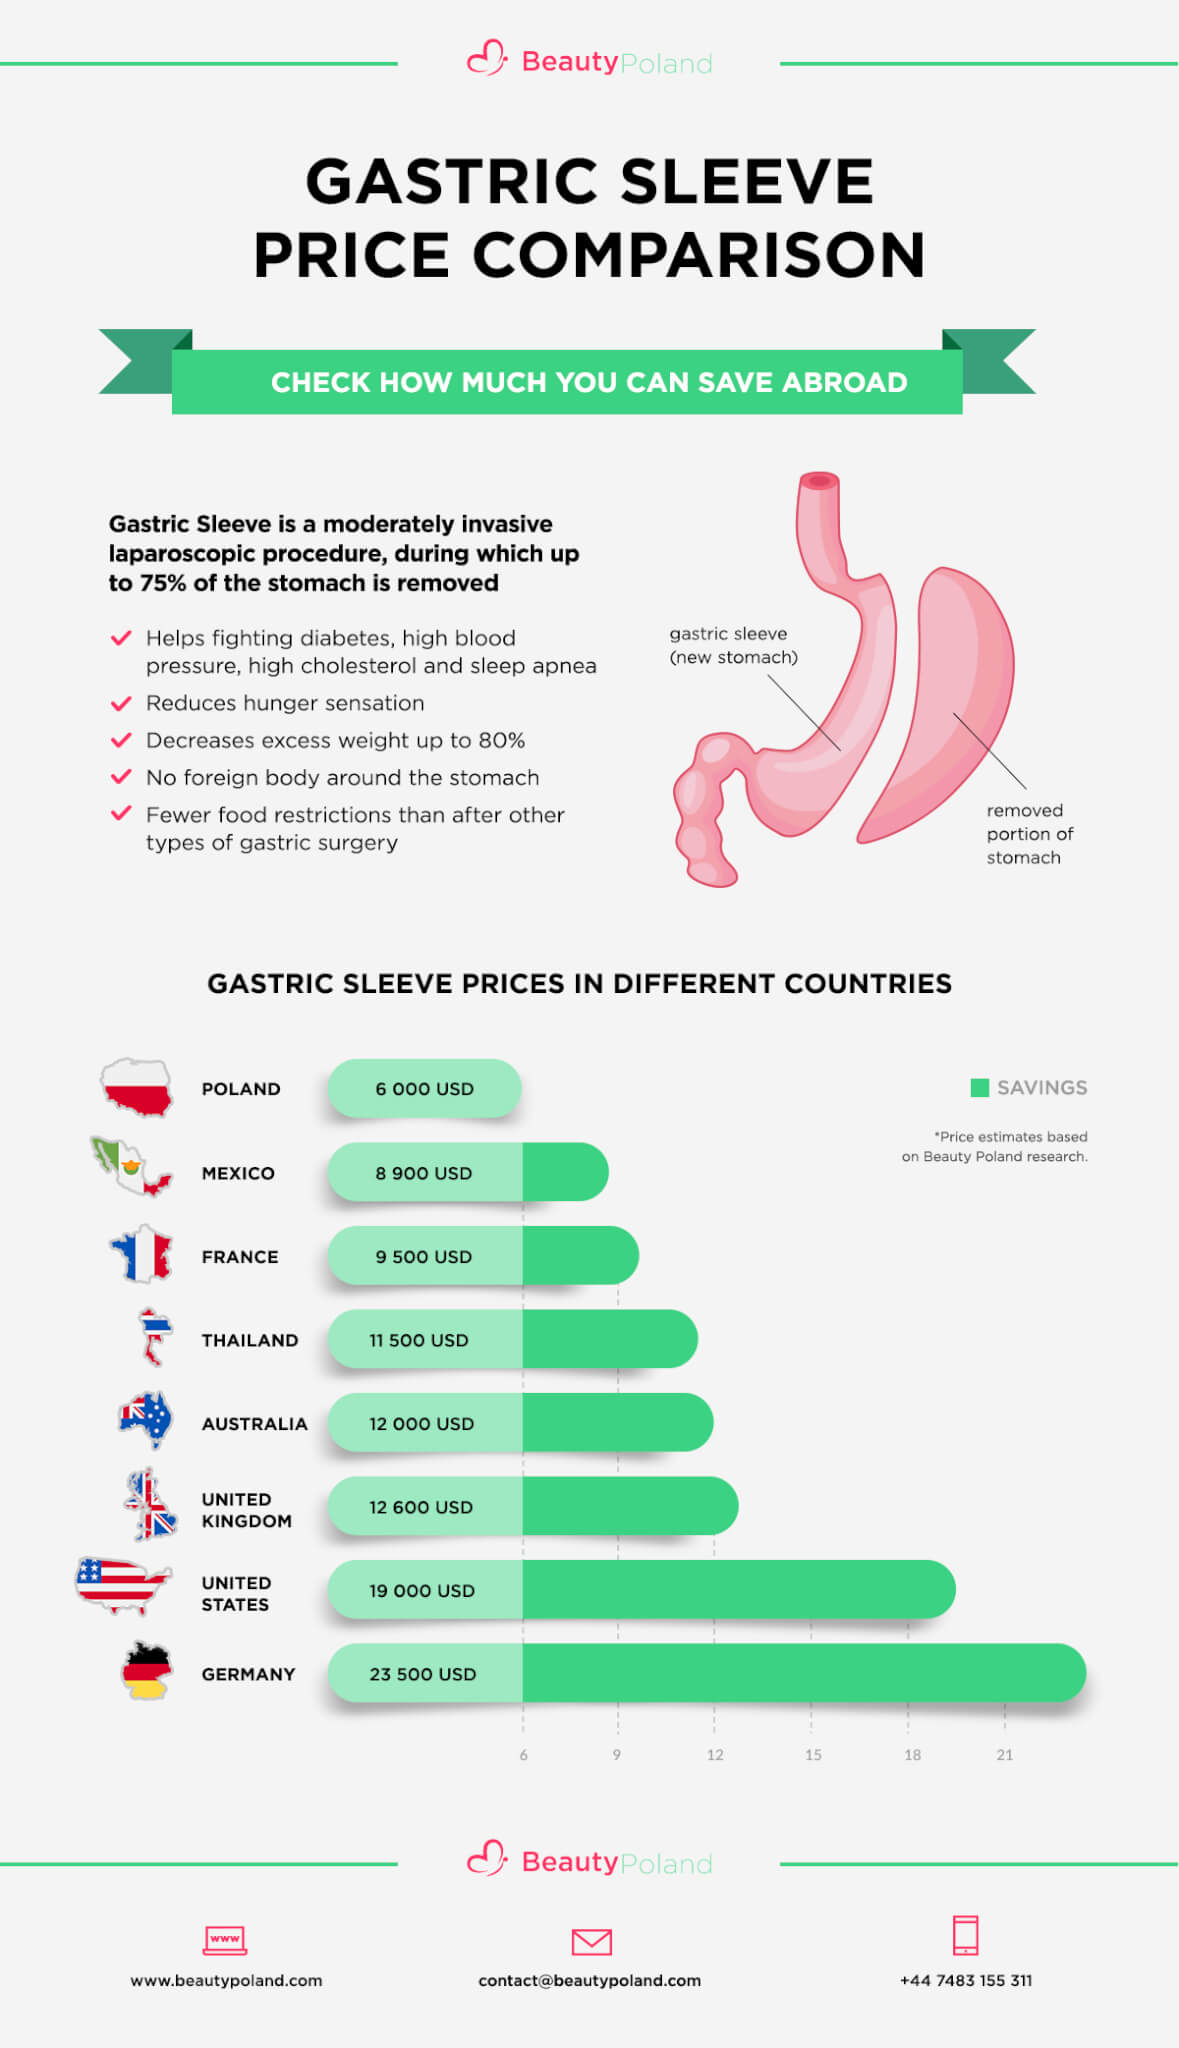 gastric-sleeve-price-comparison-infographic-plaza